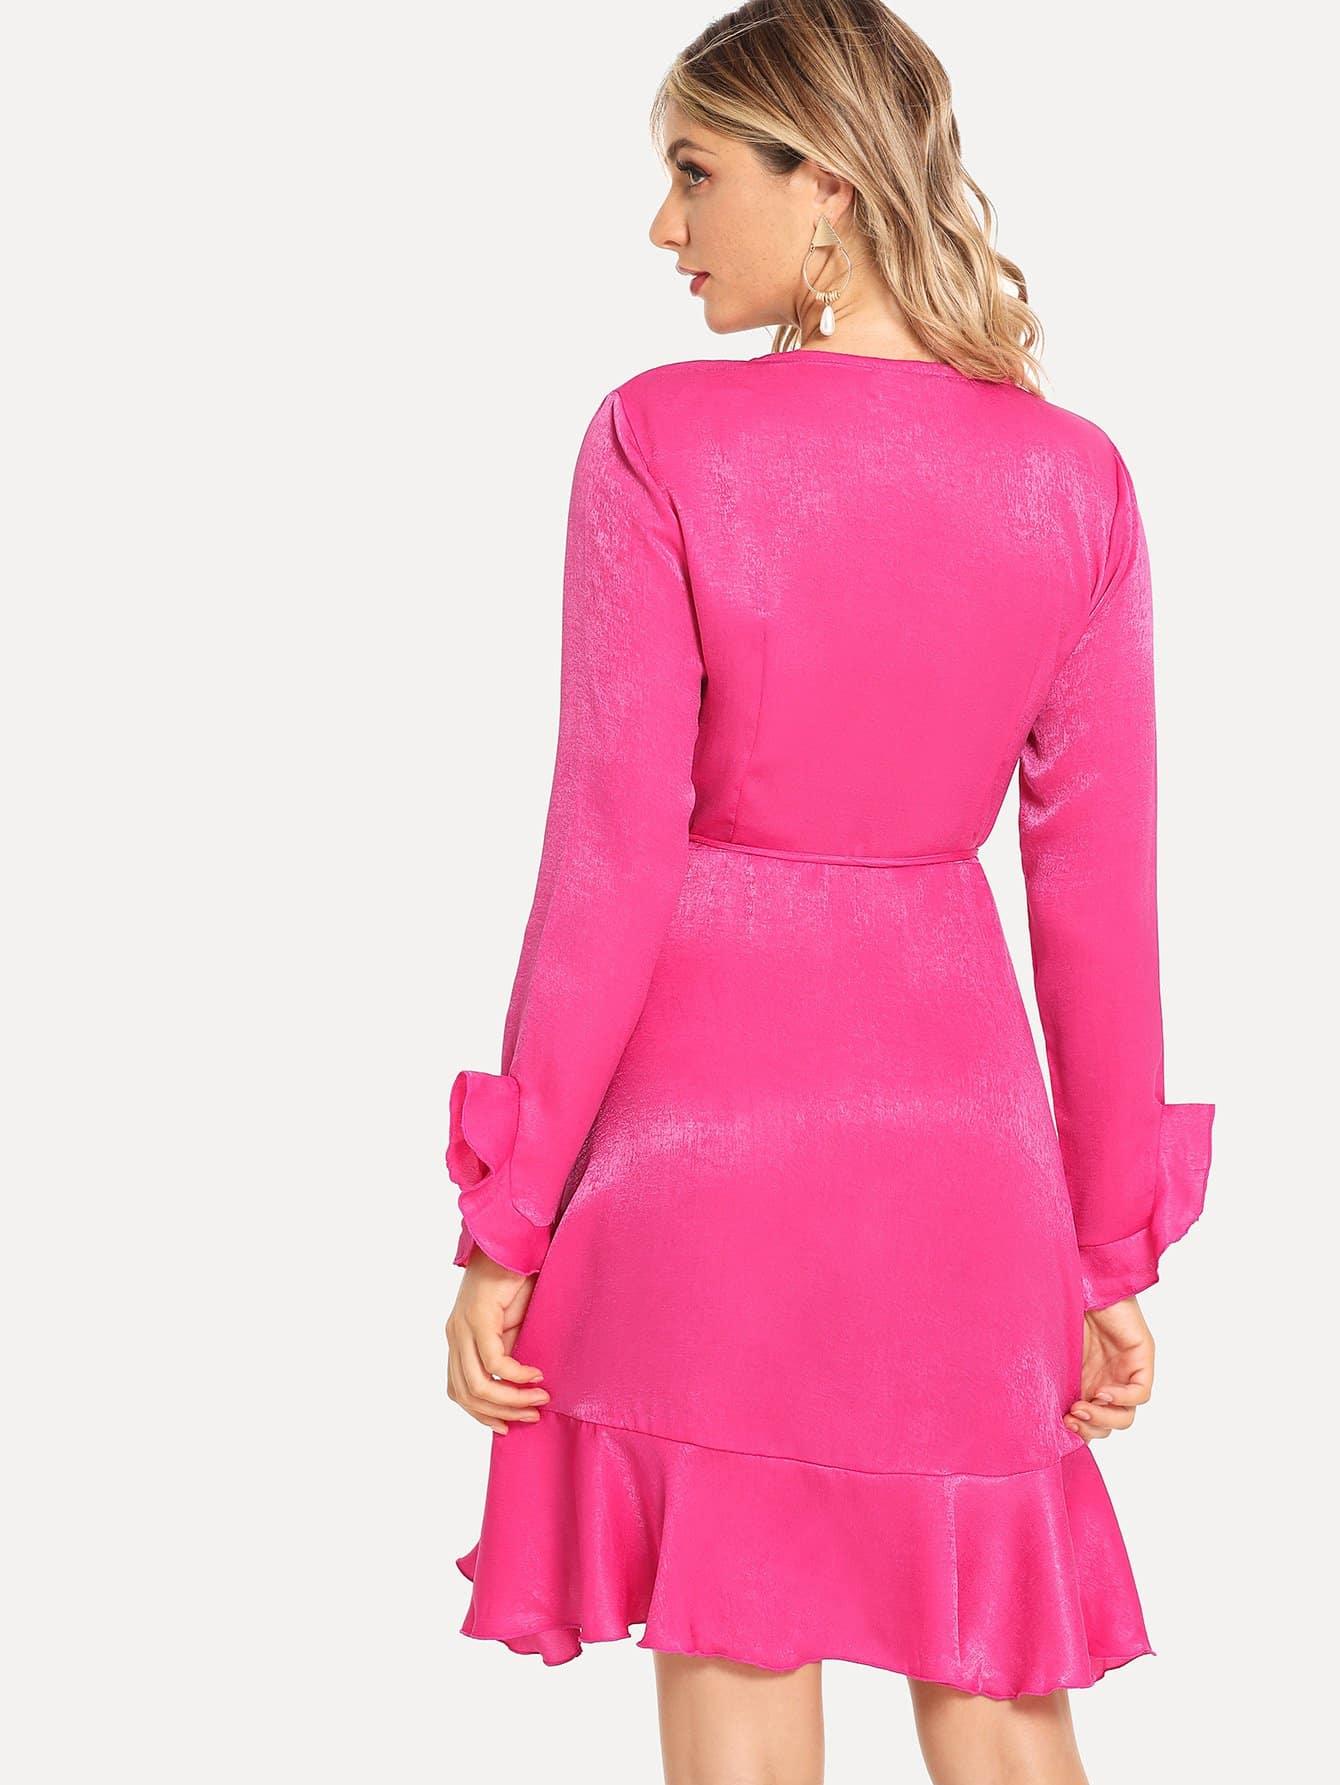 9d574cf5cb Neon Pink Ruffle Hem Wrap Bell Sleeve Dress | SHEIN IN